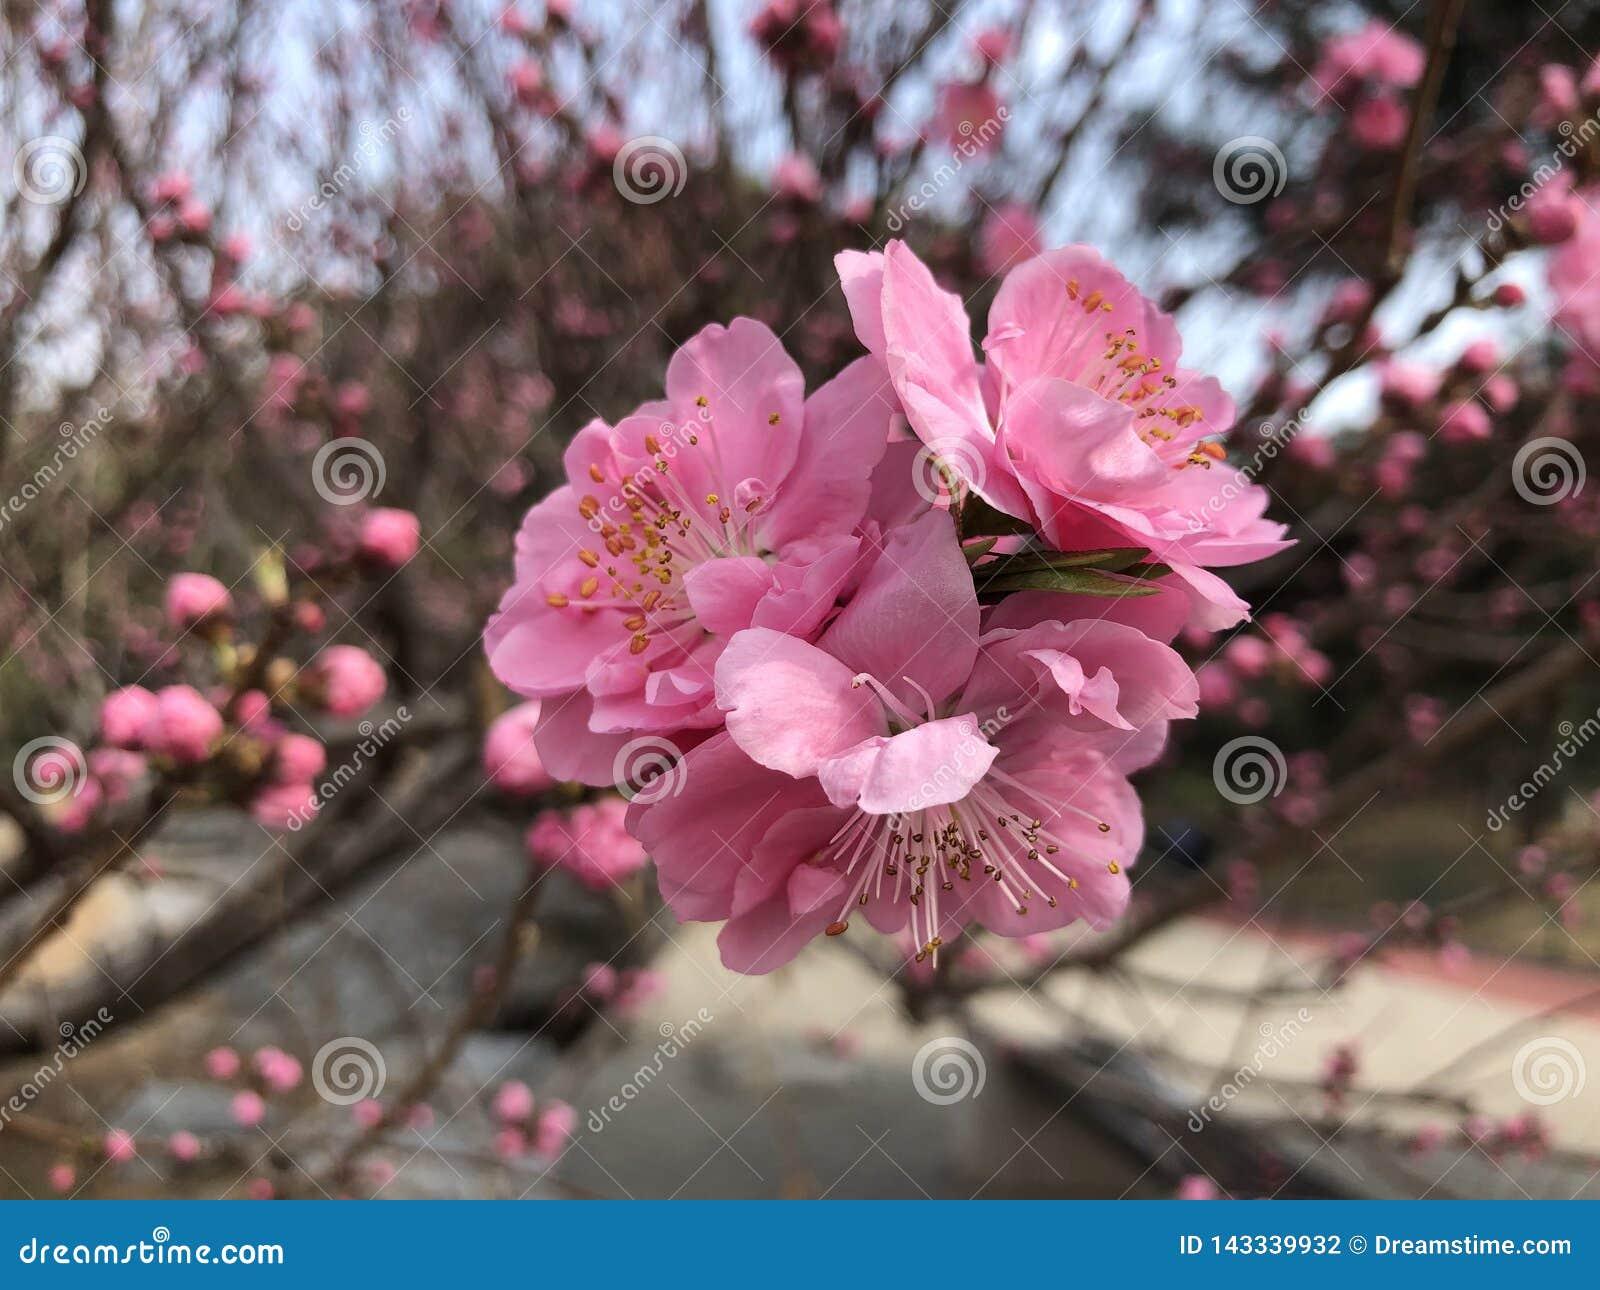 Plum blossoms in full bloom